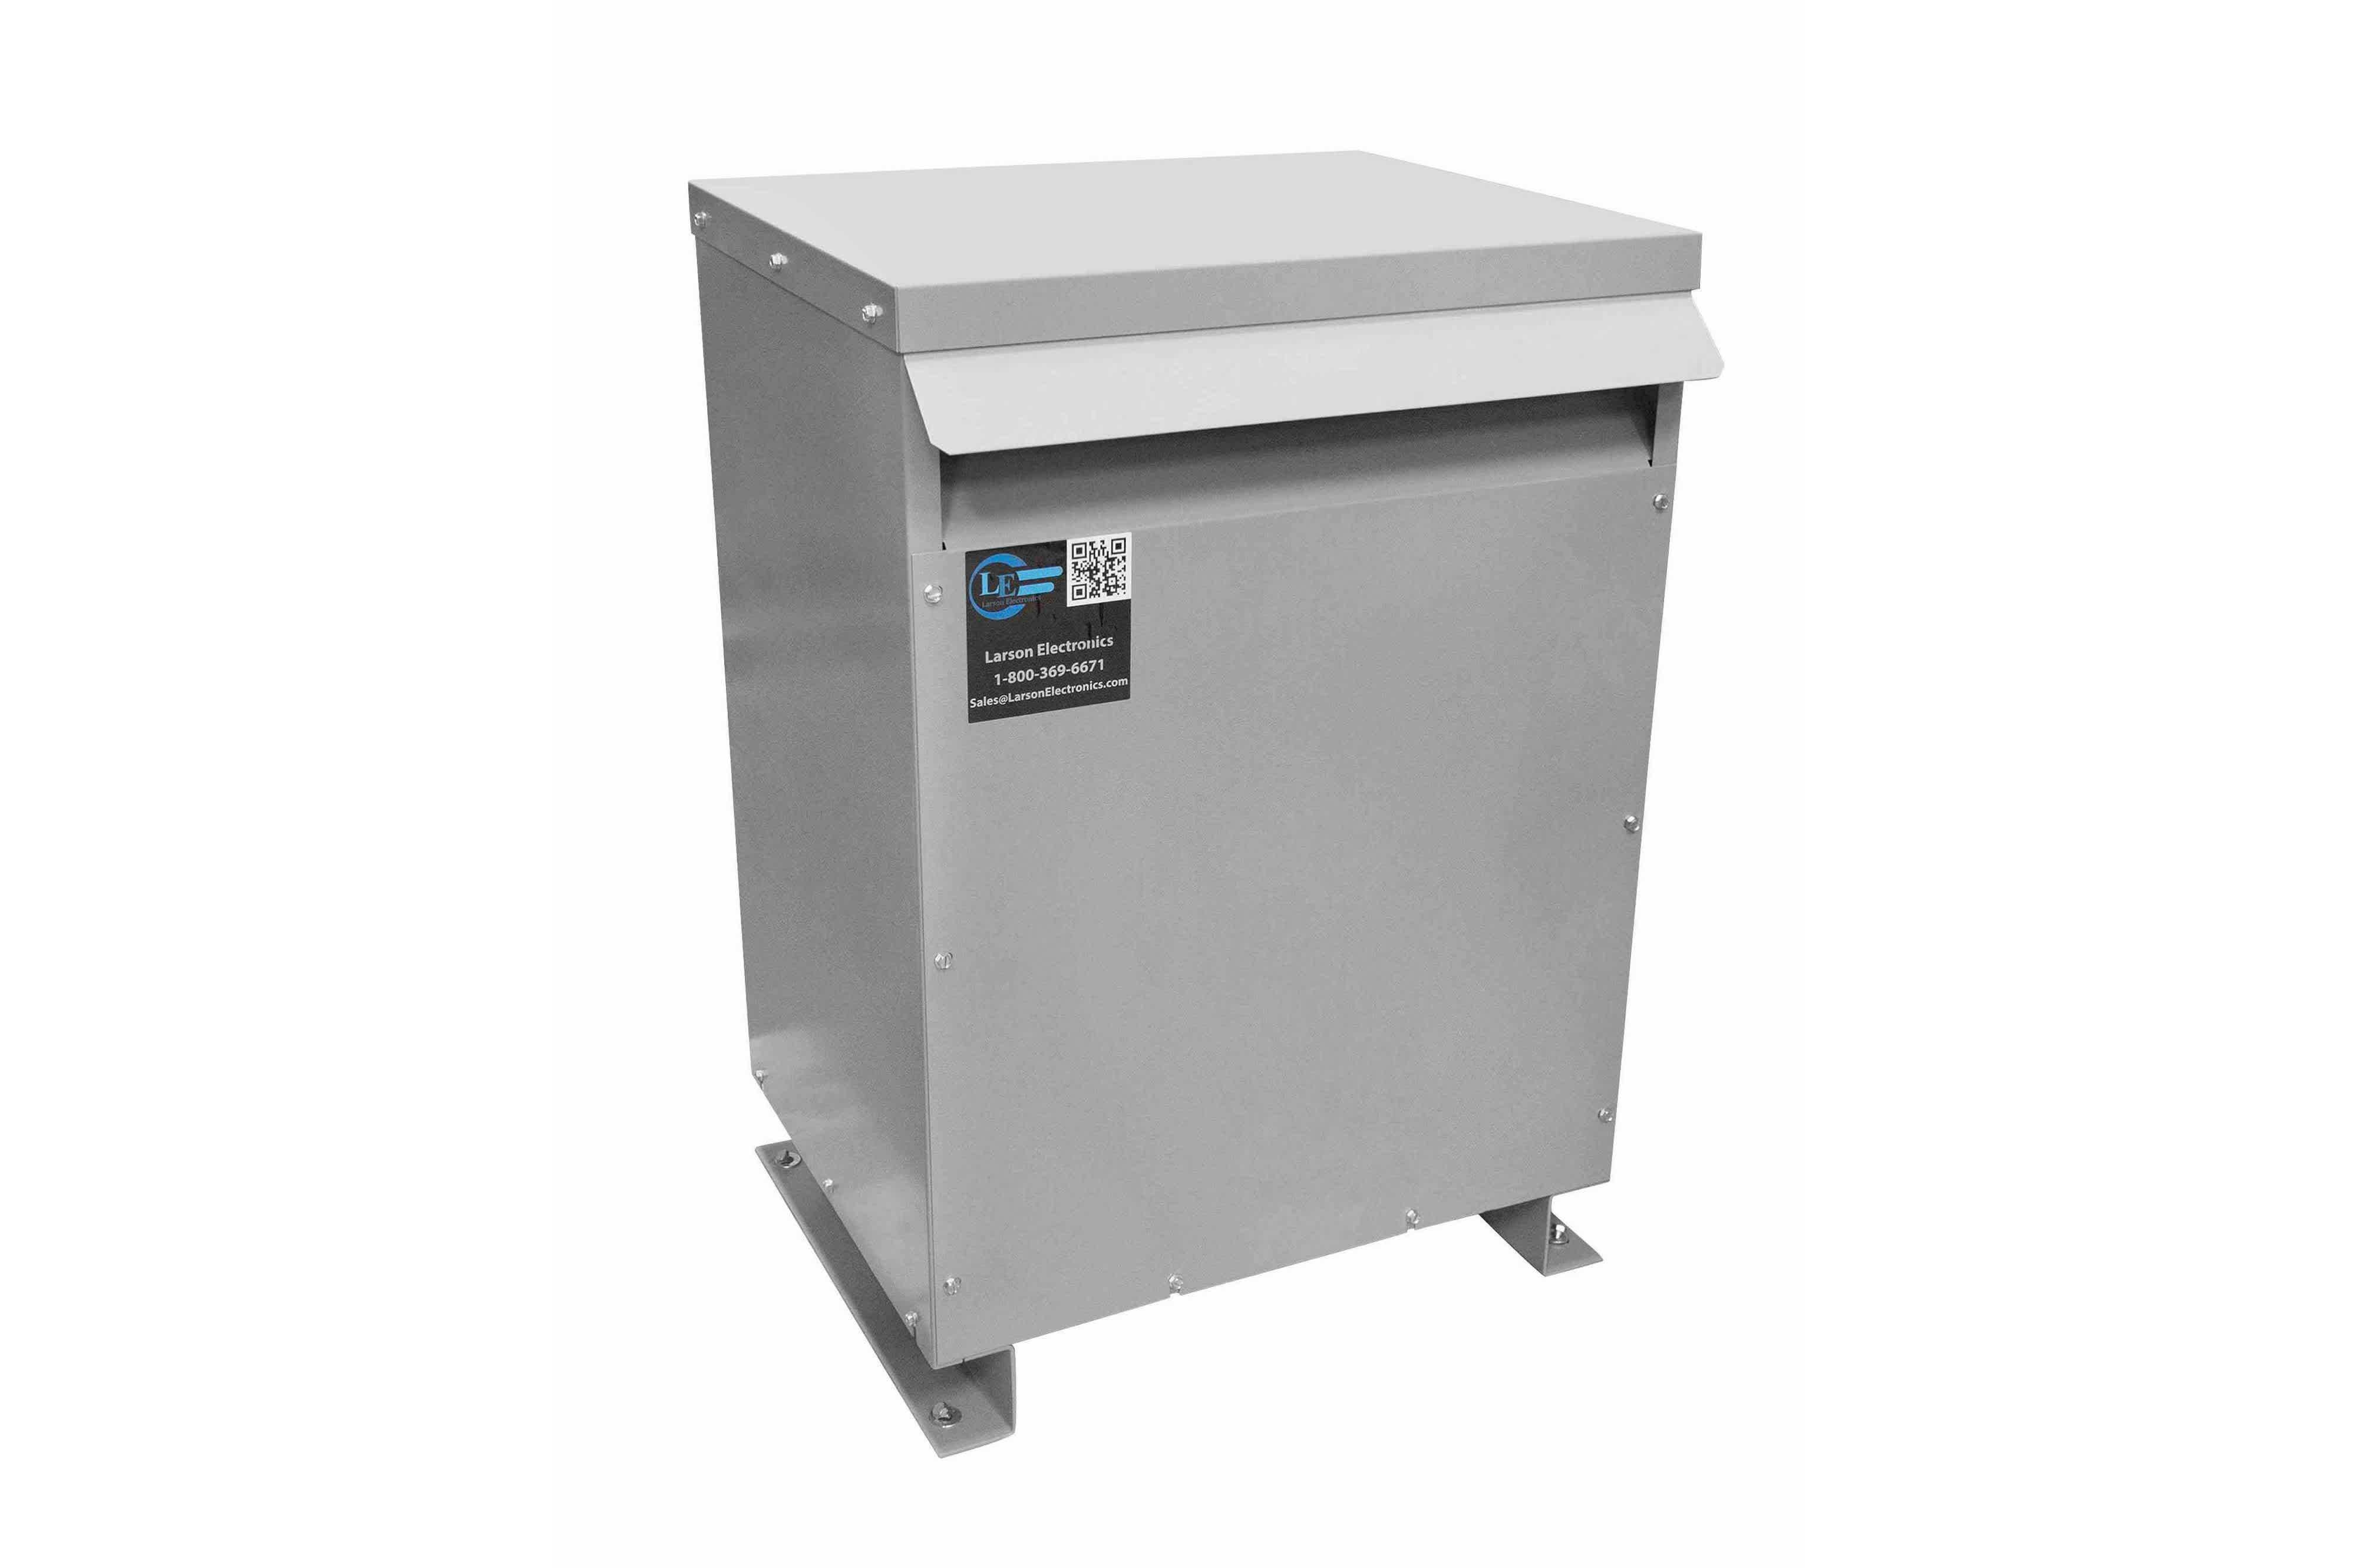 9 kVA 3PH Isolation Transformer, 480V Wye Primary, 575Y/332 Wye-N Secondary, N3R, Ventilated, 60 Hz